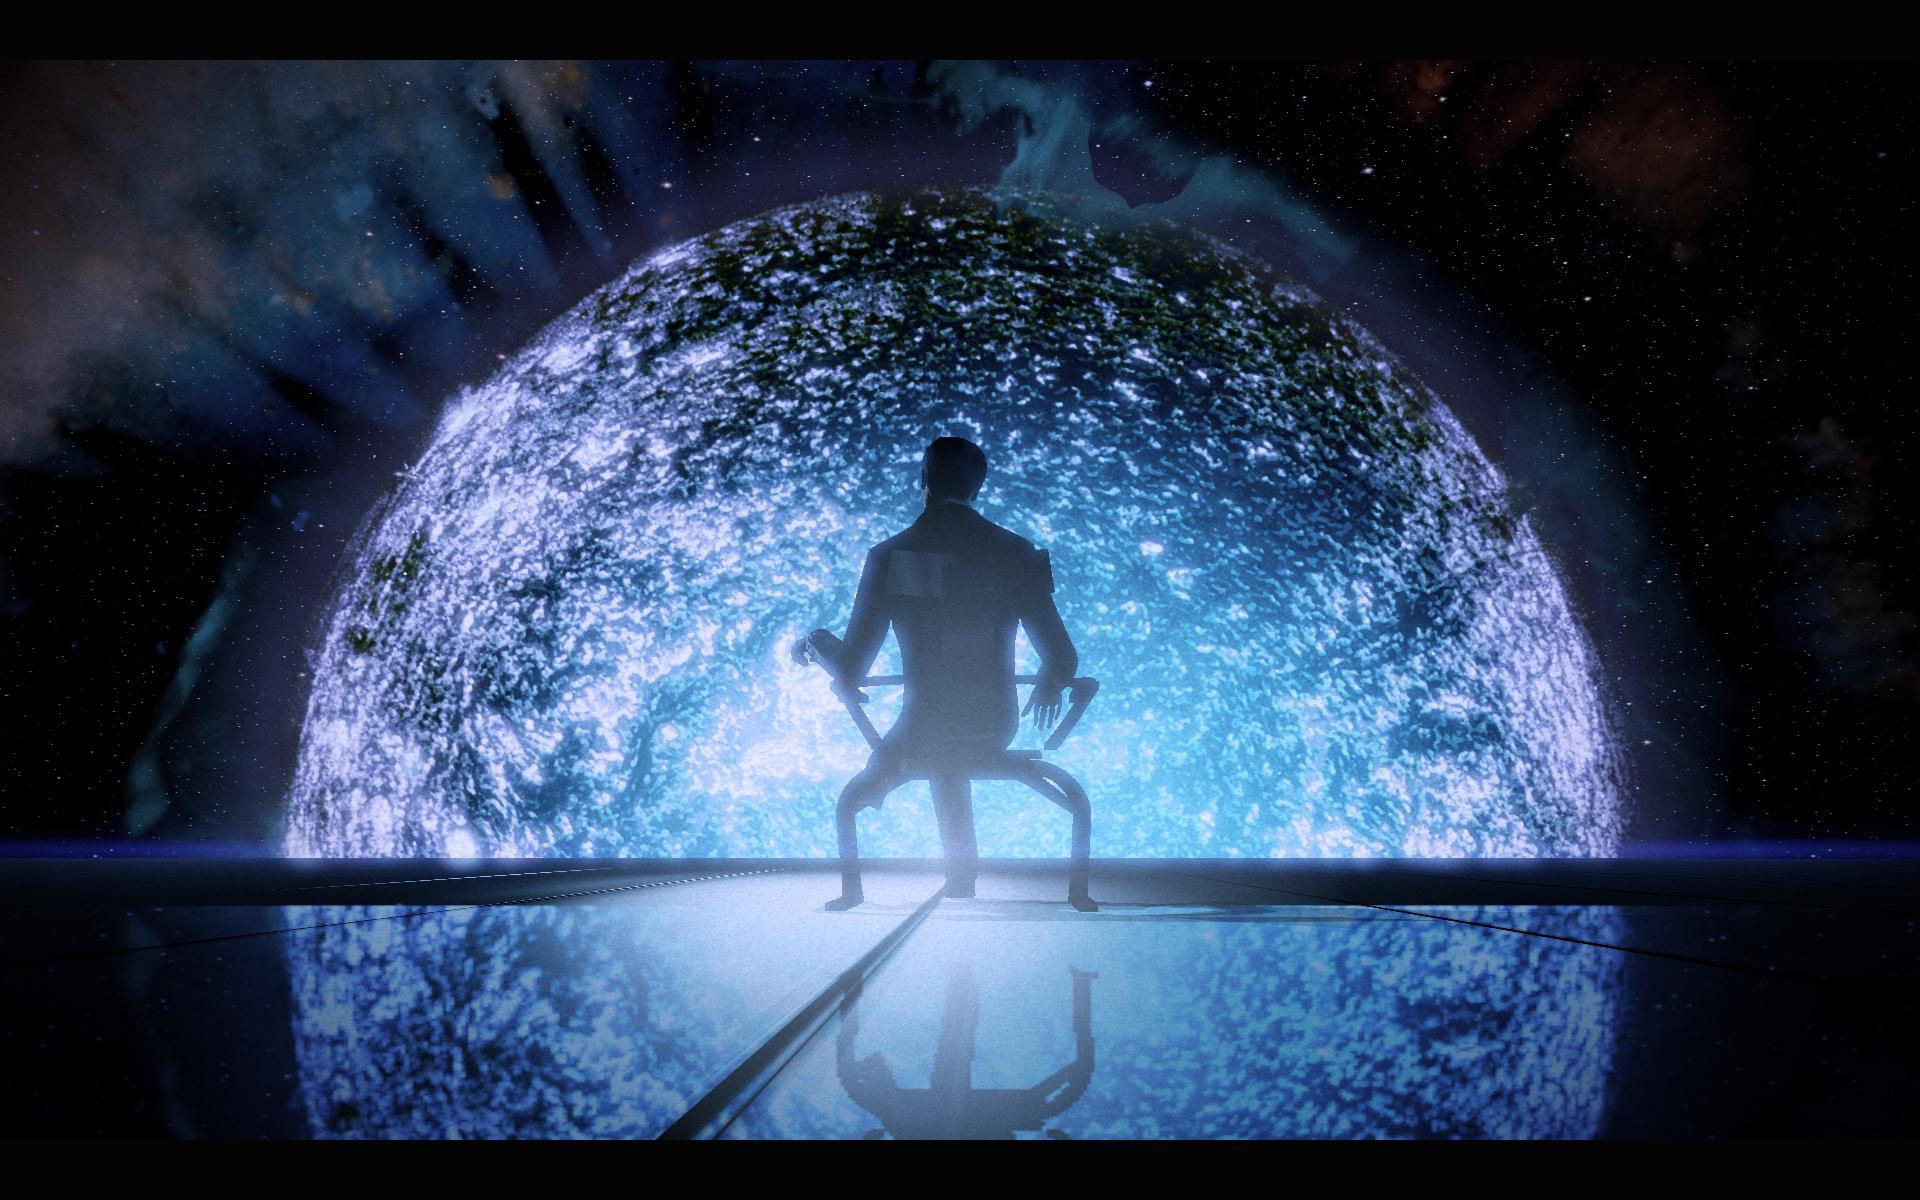 Dreamscene Wallpapers Hd Mass Effect Desktop Wallpapers Wallpaper Cave